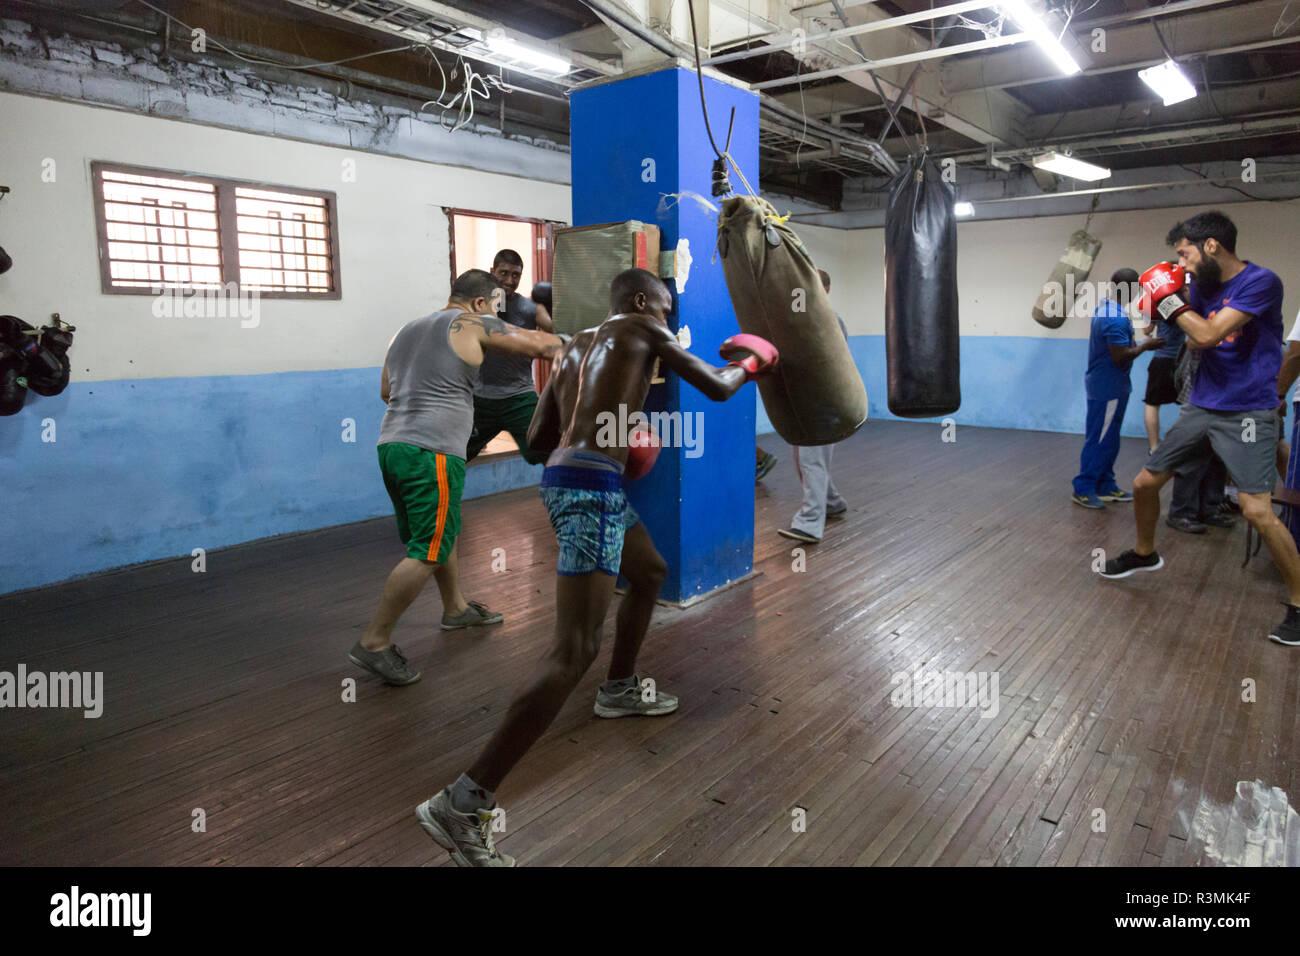 Cuba, Havana. Boxers training in gym. Credit as: Wendy Kaveney / Jaynes Gallery / DanitaDelimont.com Stock Photo